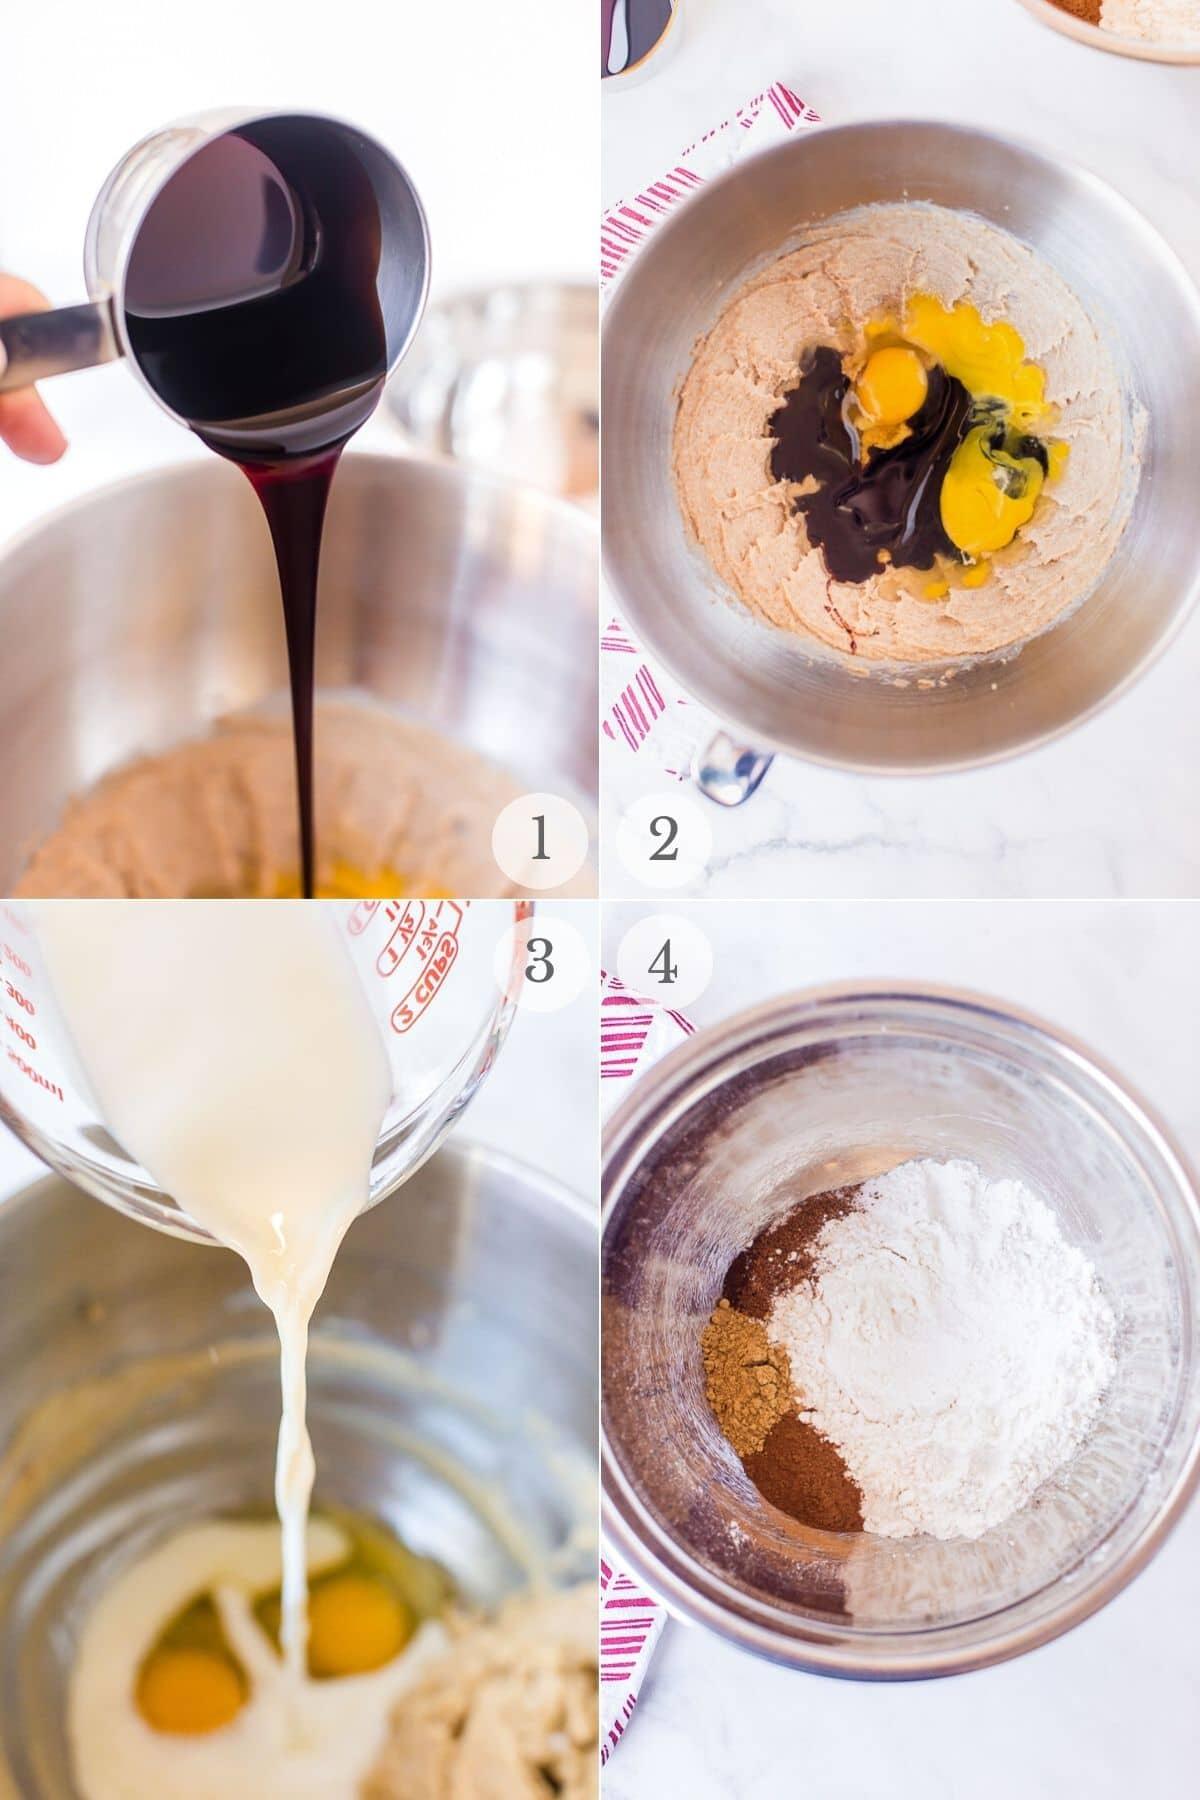 gingerbread cupcakes recipe steps 1-4